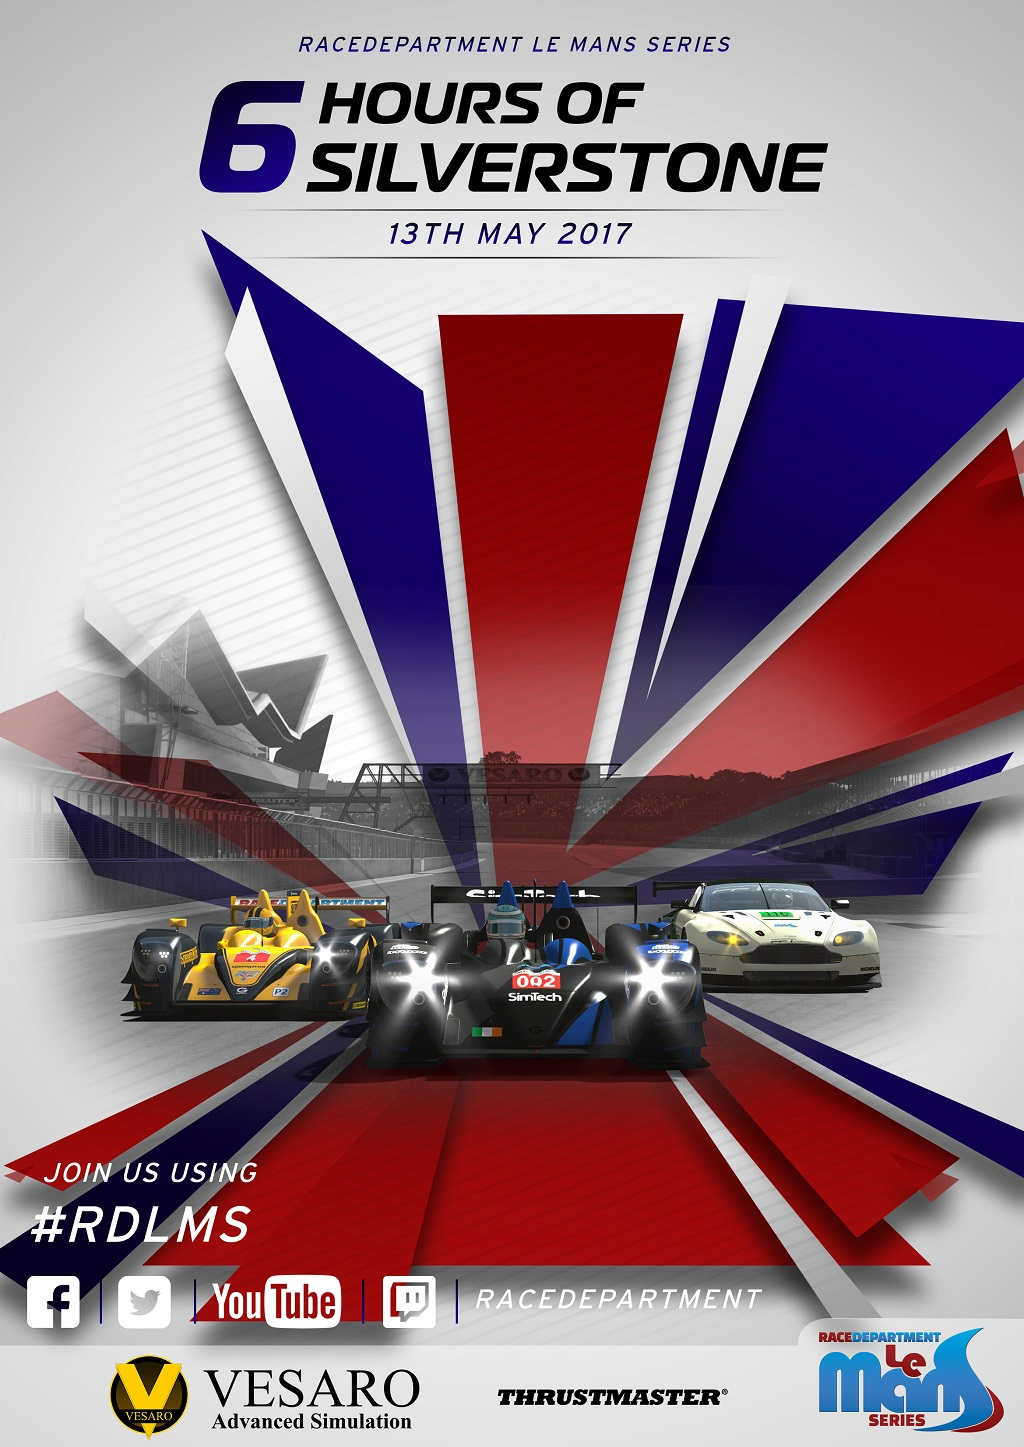 RDLMS by Vesaro Round 2 - Silverstone Poster.jpg